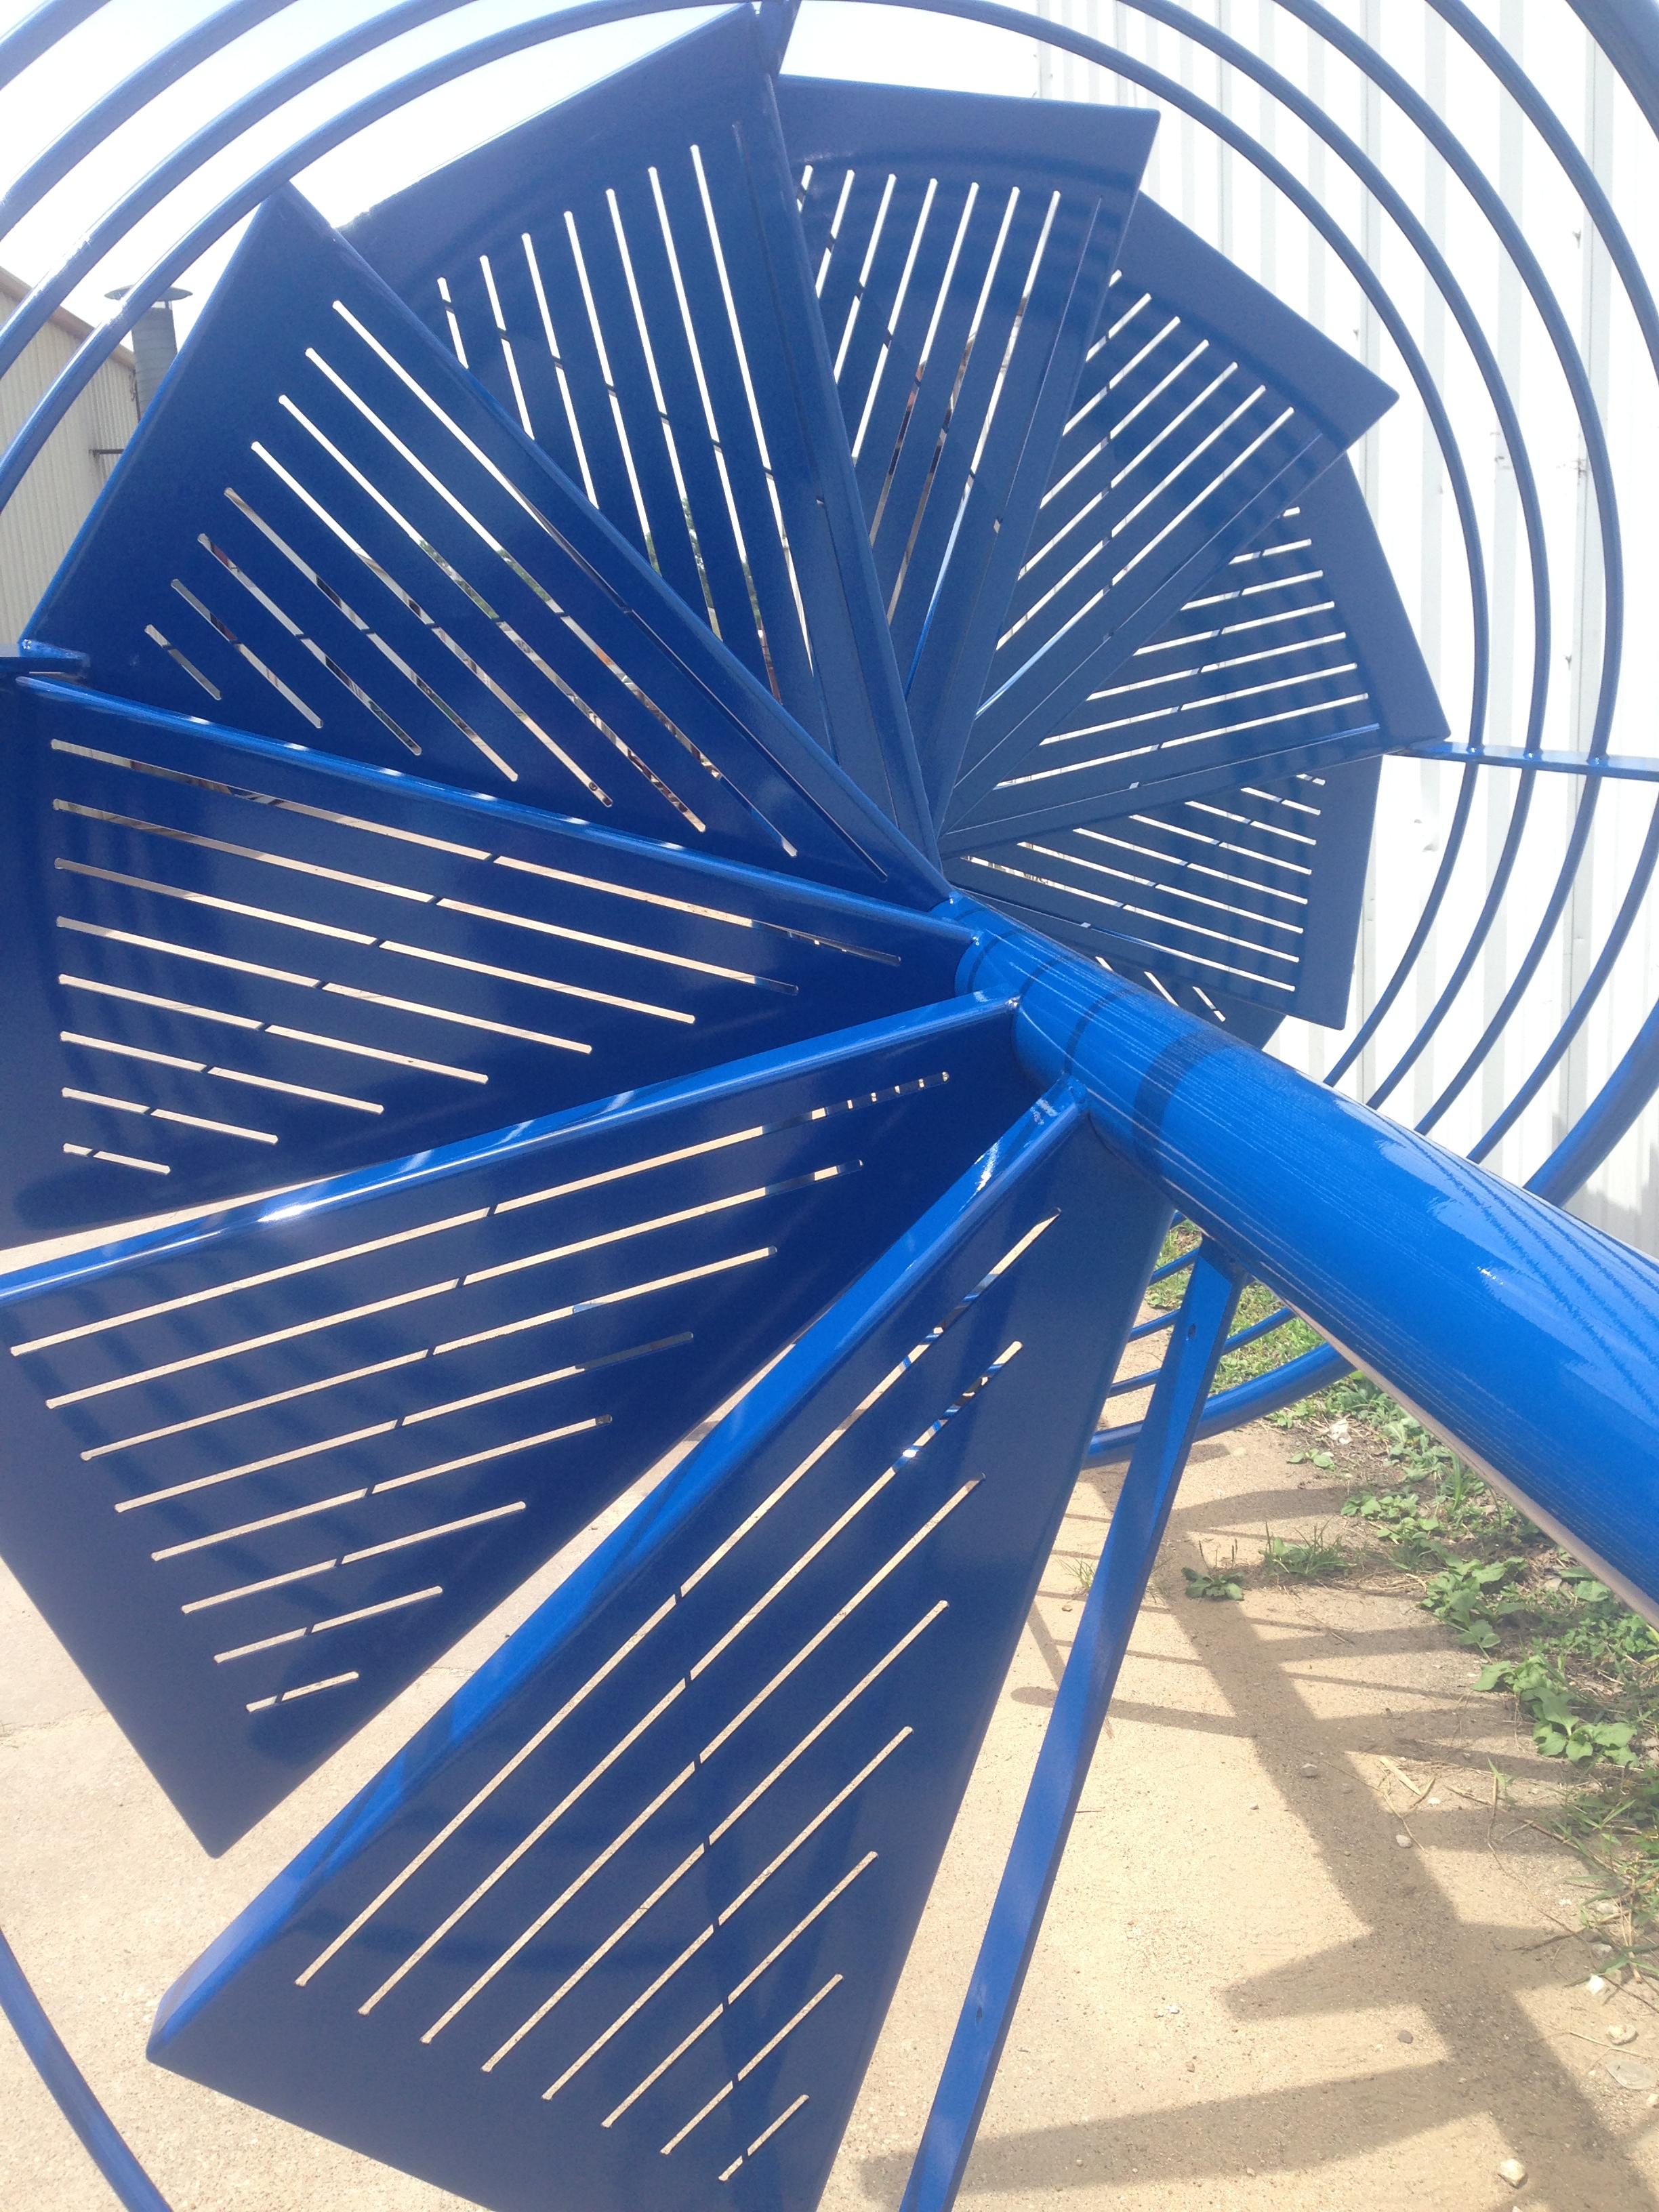 Spiral staircase kits circular spiral stairs kit for Circular stair